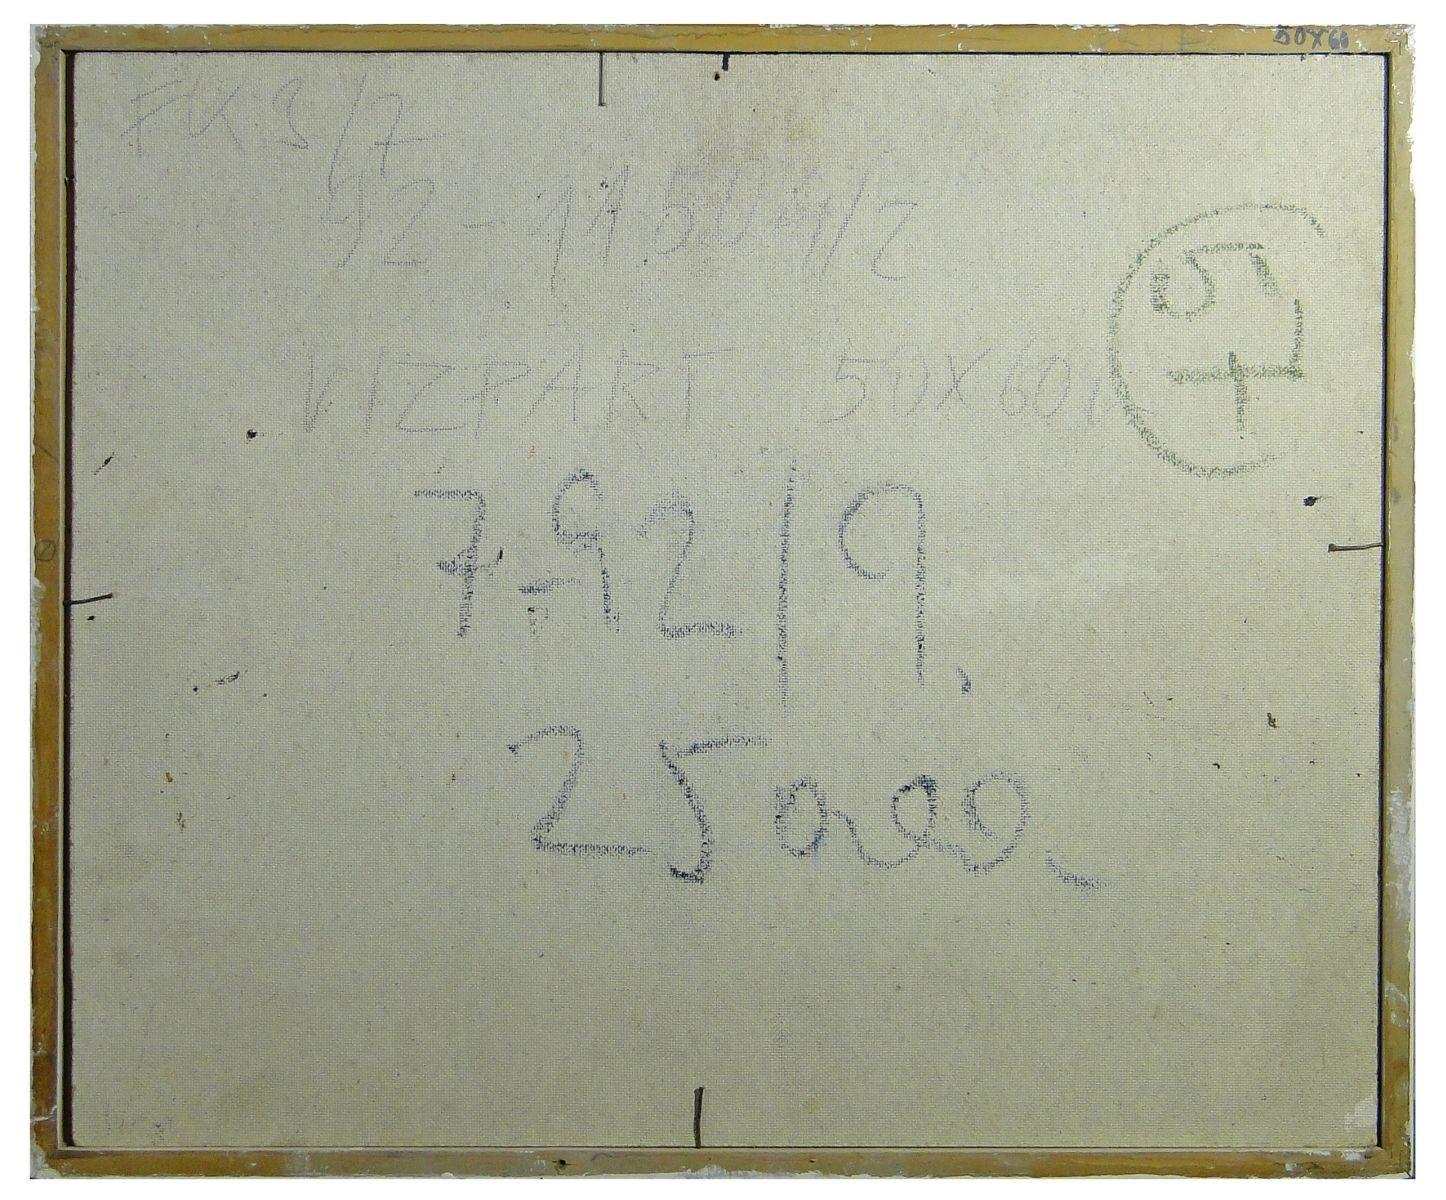 DSC07318.JPG (1446×1200)